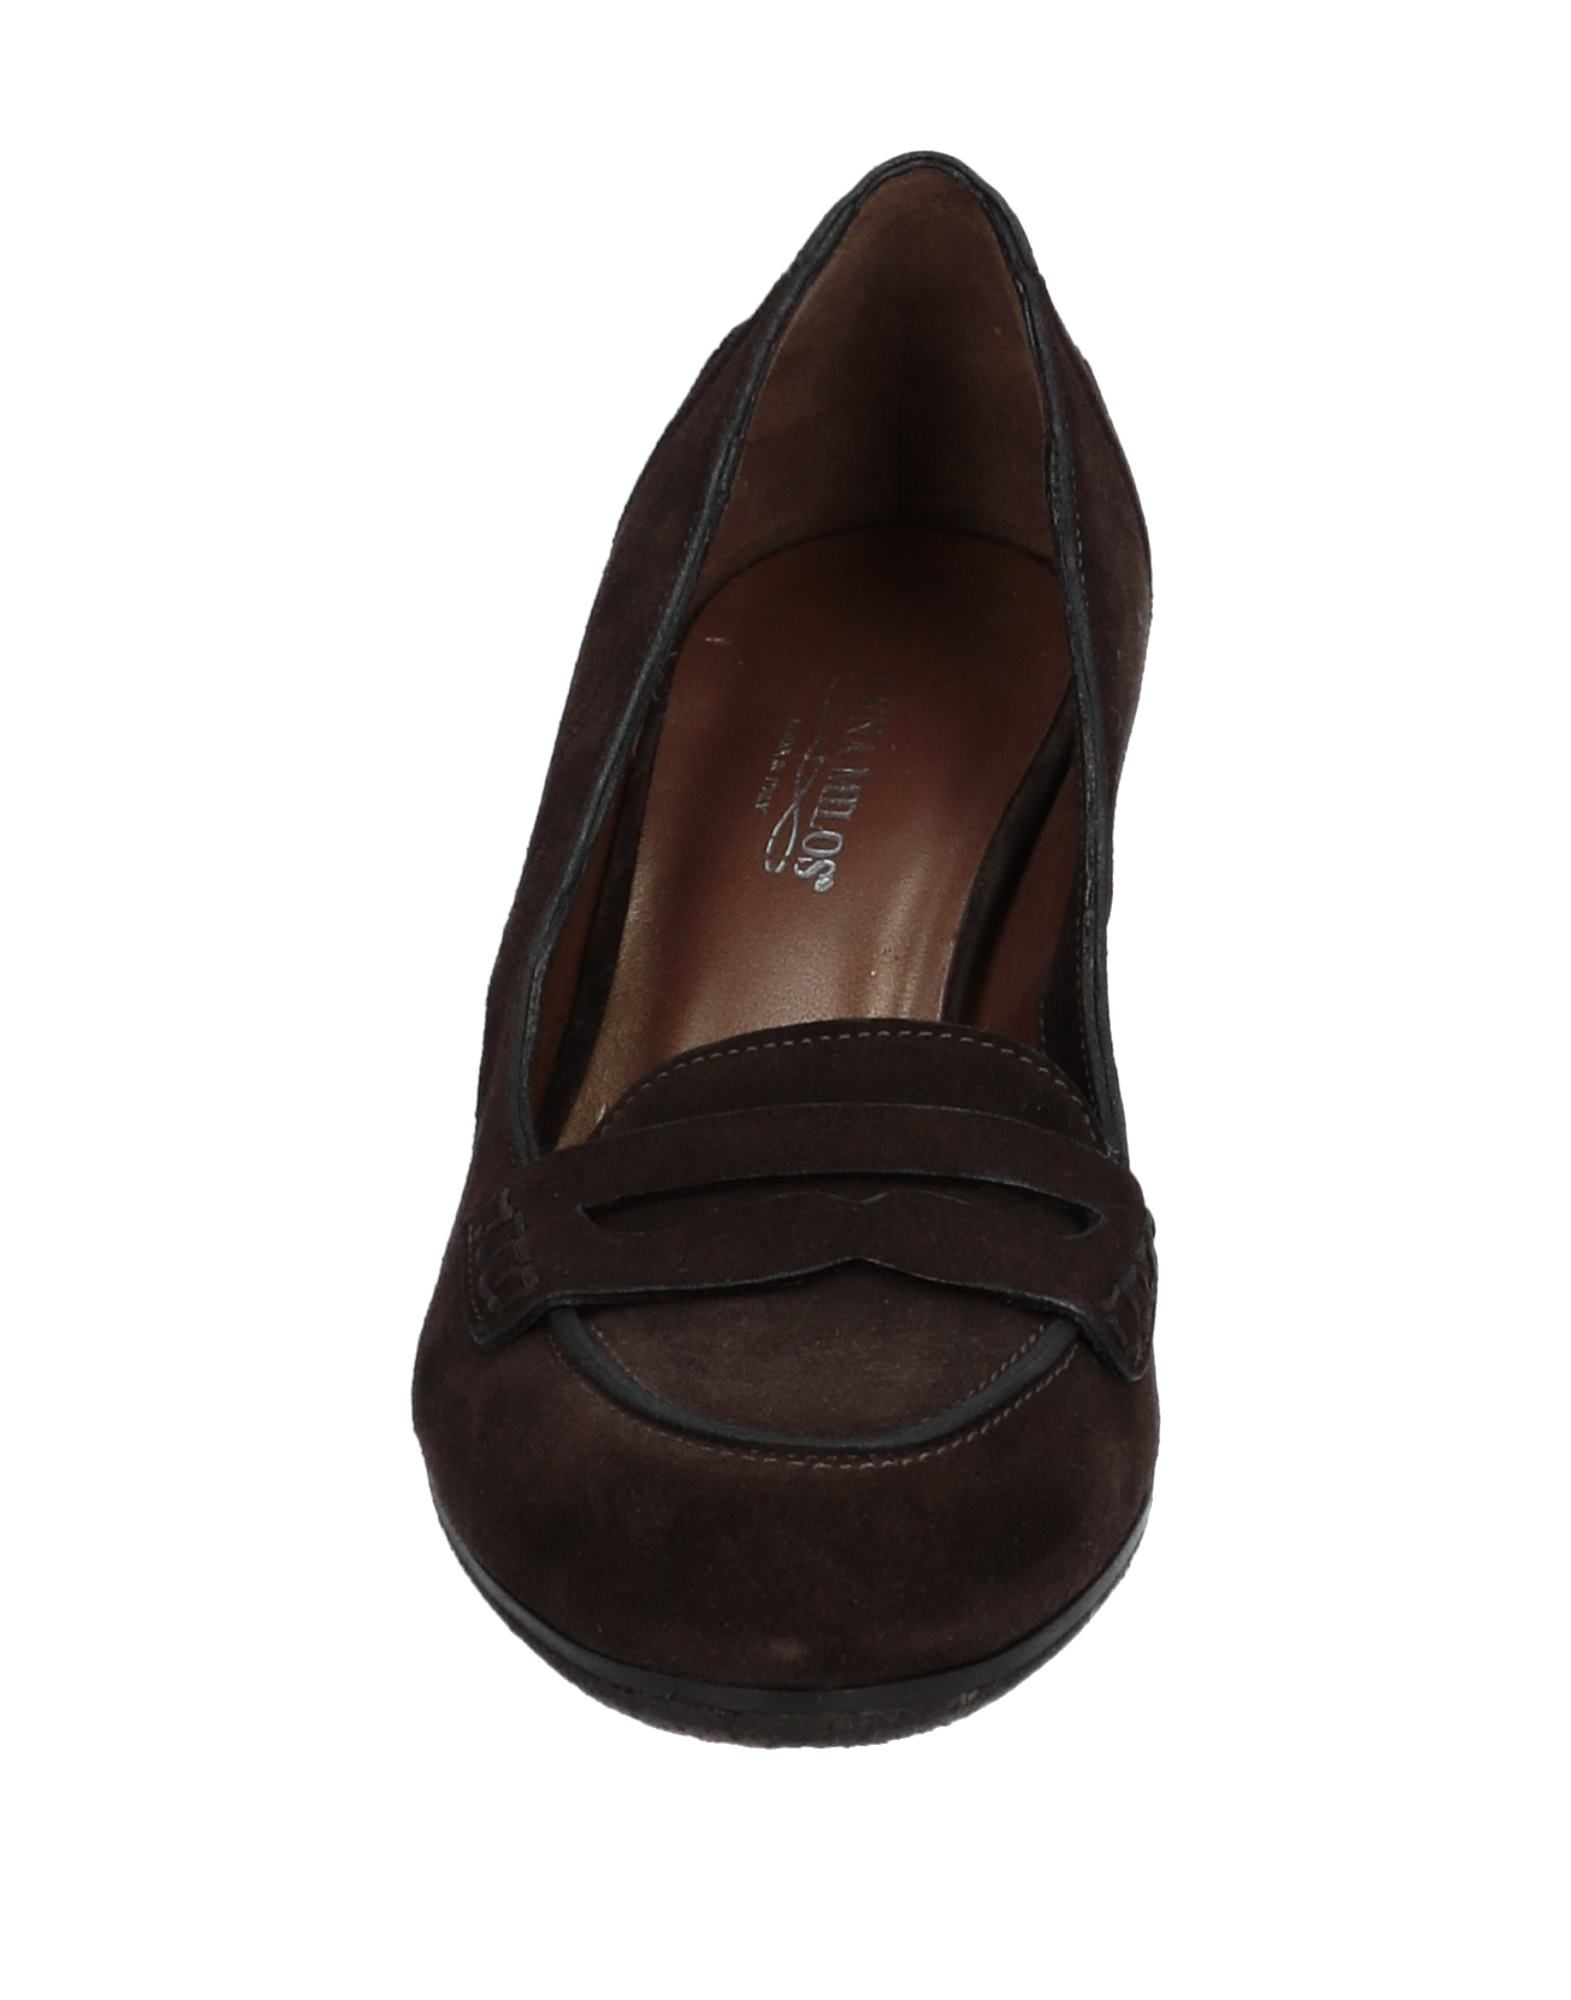 Stilvolle billige Schuhe Lena Milos Mokassins Damen 11524875WJ 11524875WJ Damen fd6793